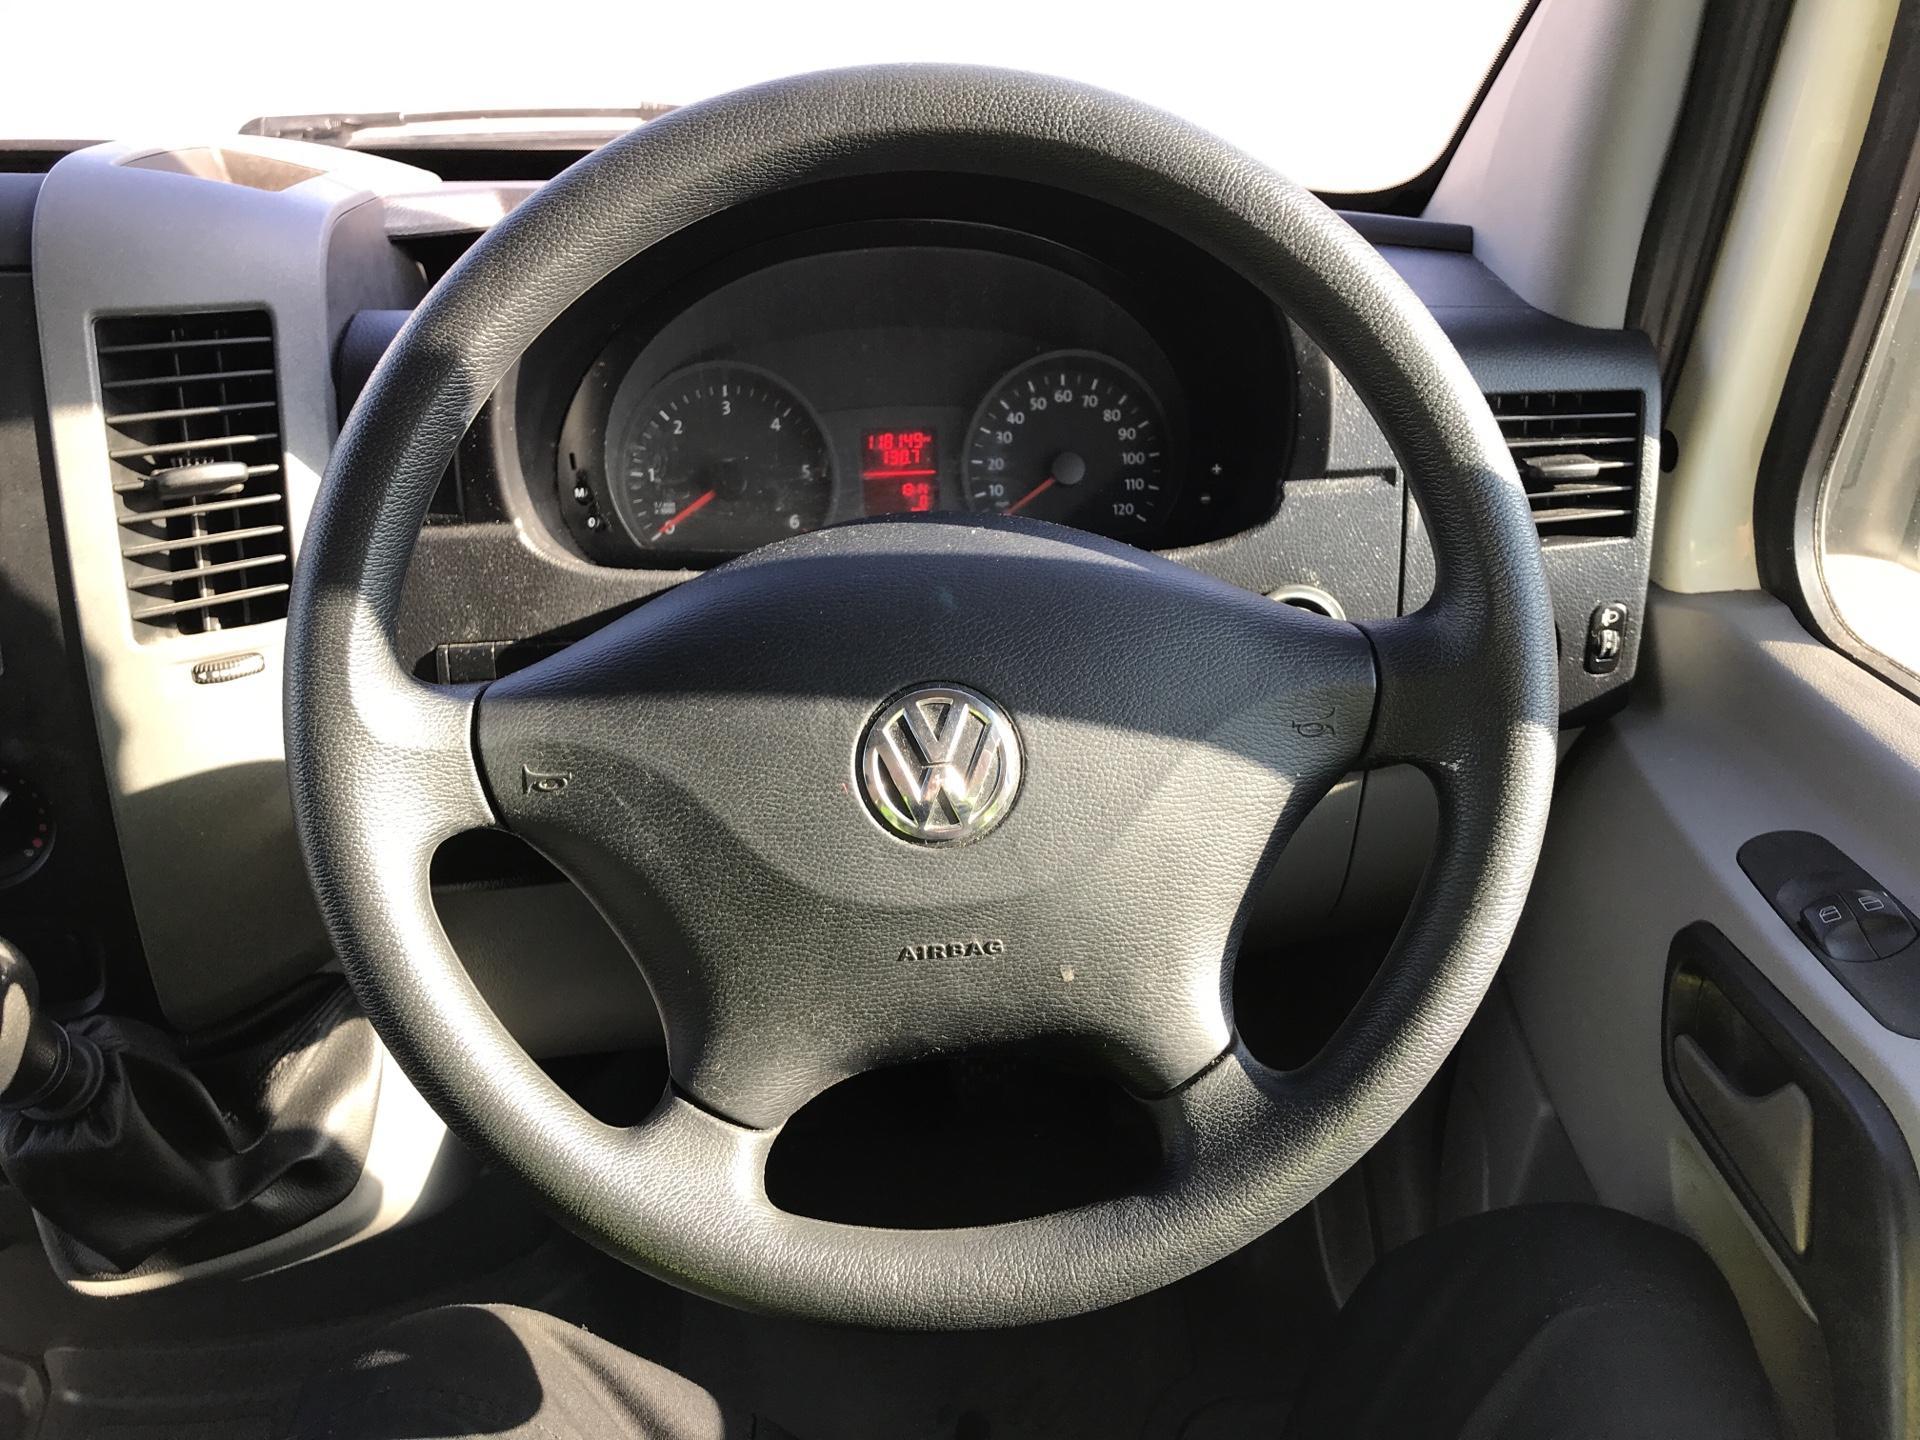 2016 Volkswagen Crafter 2.0 Tdi 136Ps LWB LUTON VAN EURO 5 (GJ66OUK) Image 12